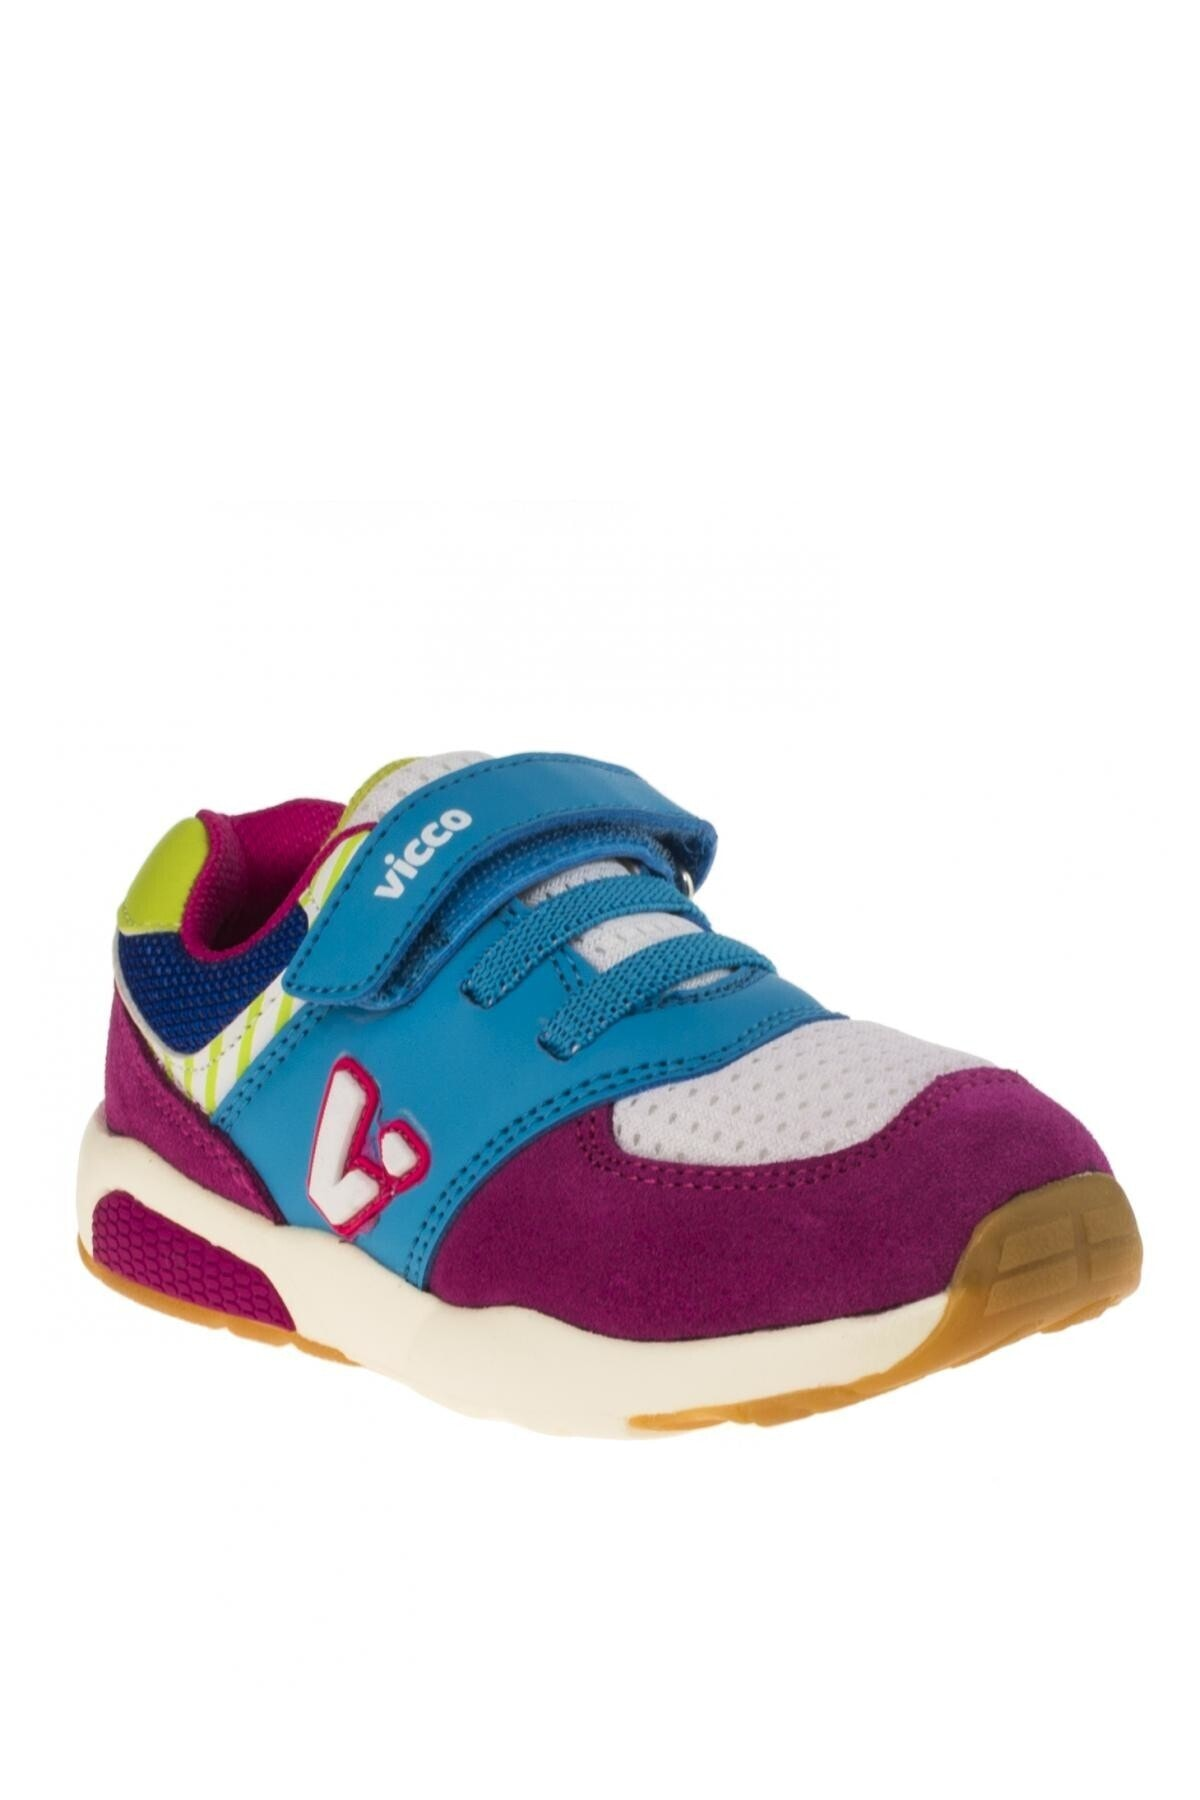 Vicco Erkek Çocuk Mavi-Pembe Ayakkabı 211 34718y152p Sneaker 1